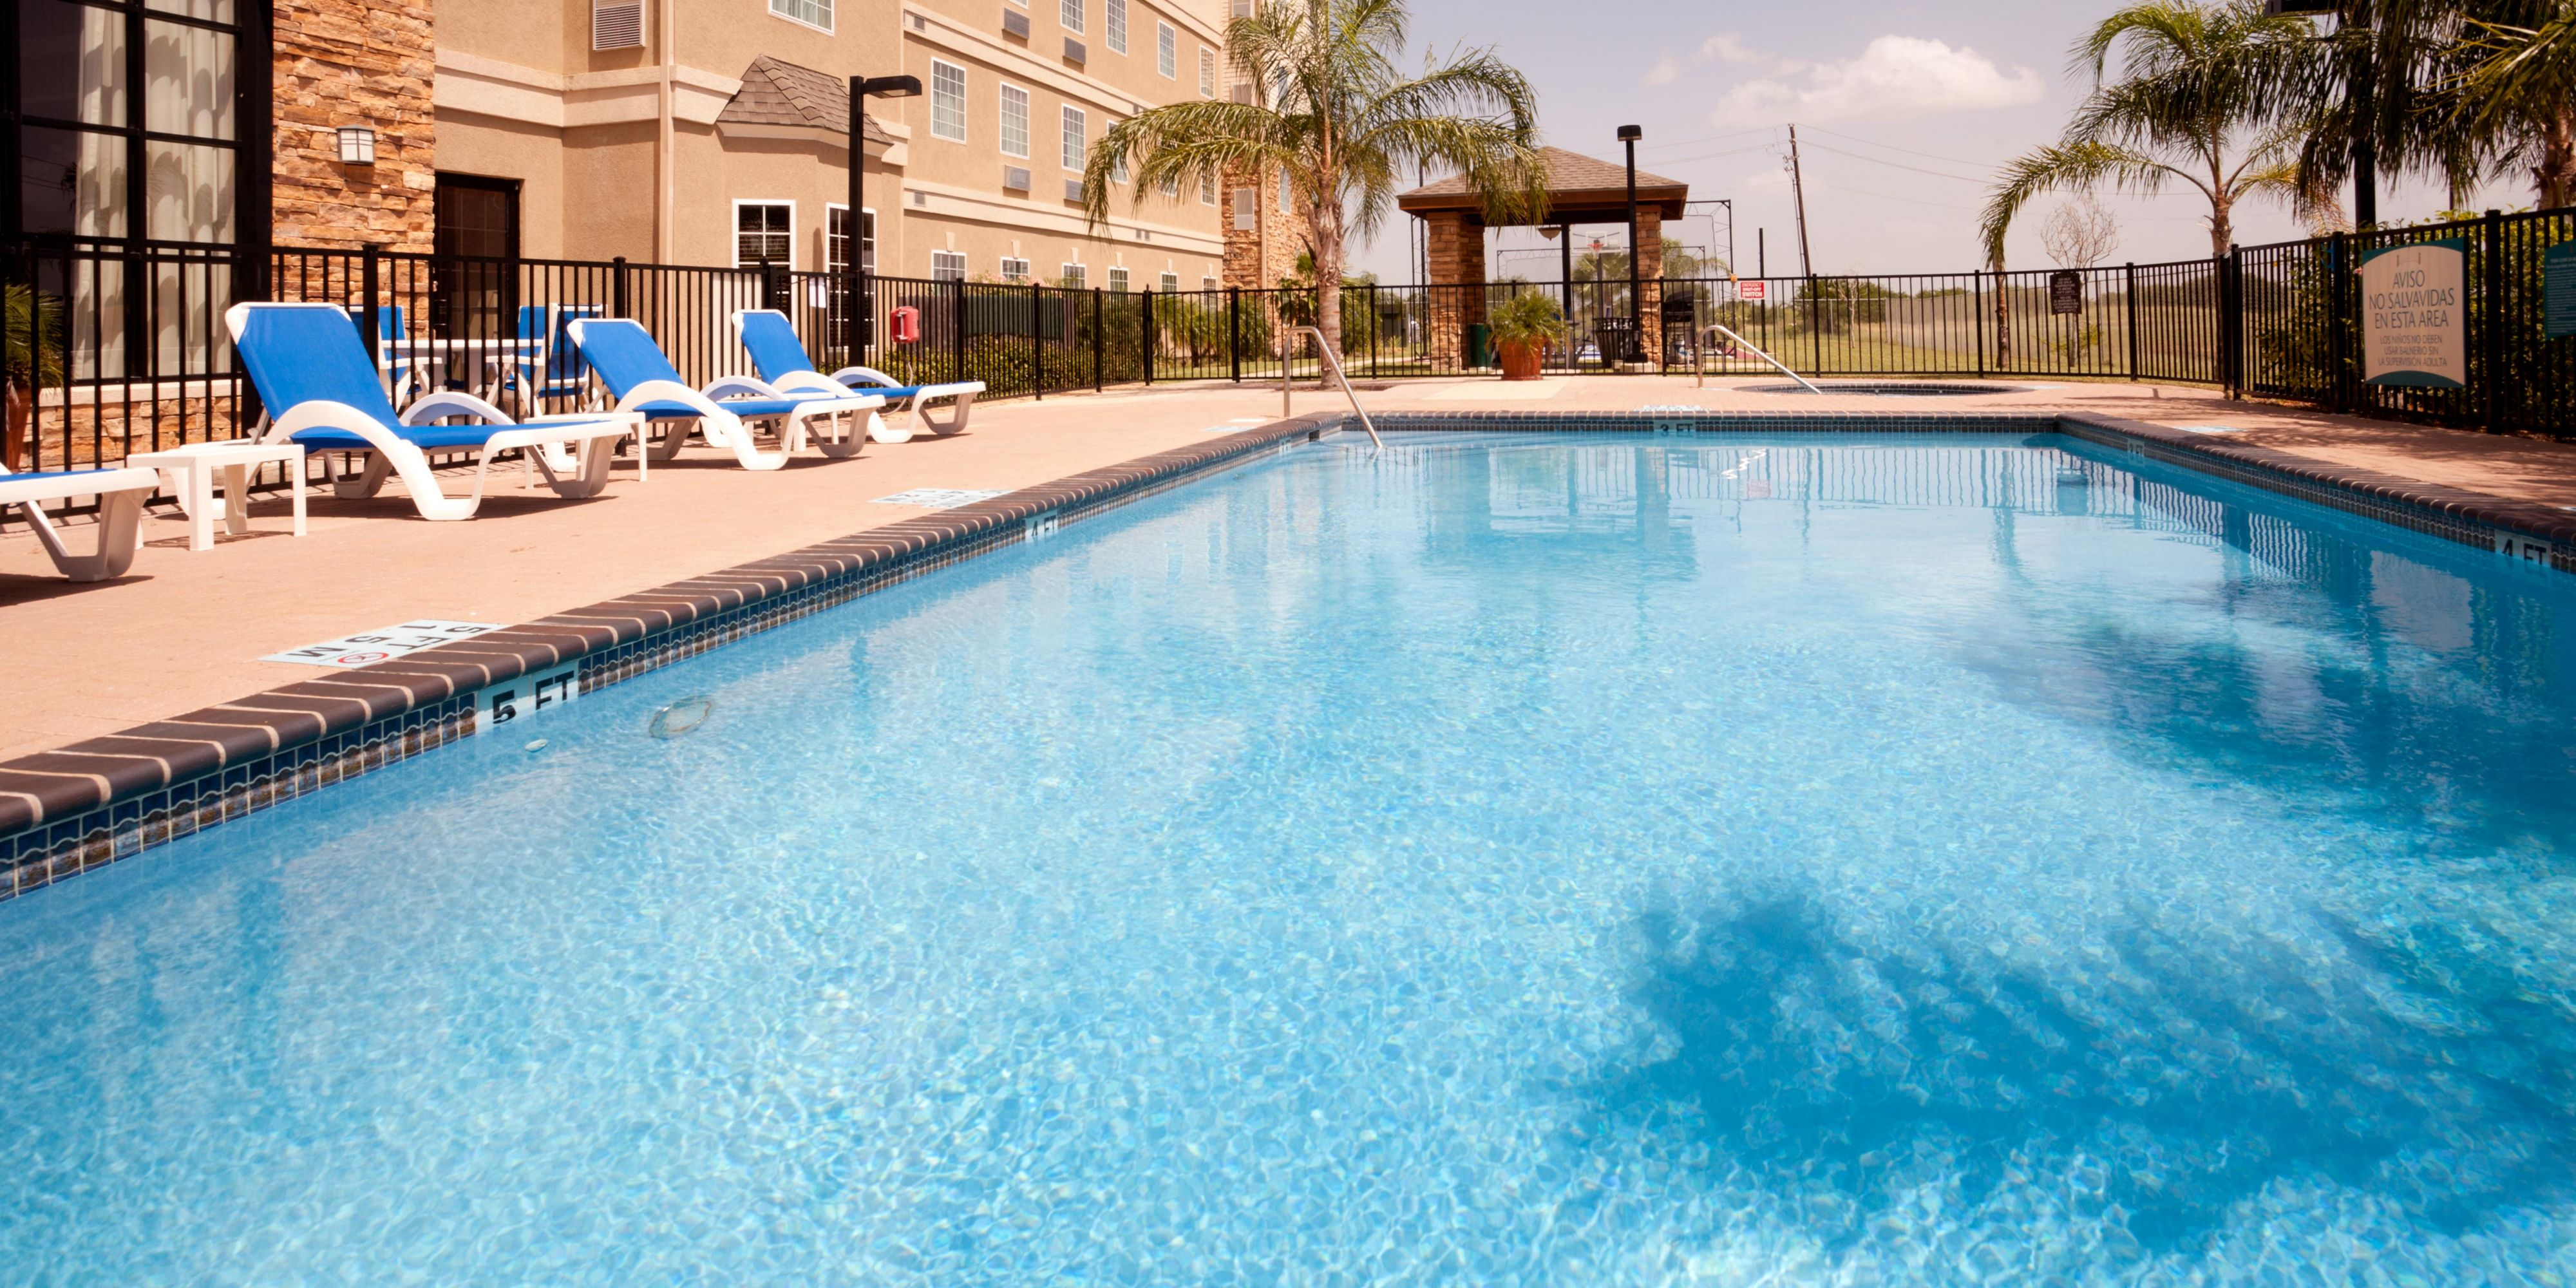 Staybridge Suites Brownsville image 2